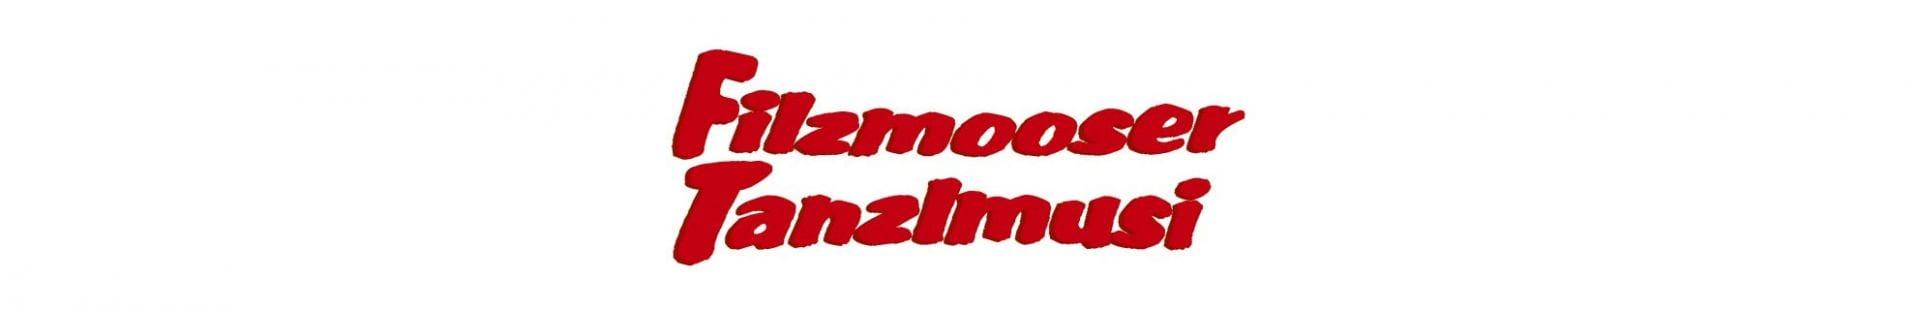 Filzmooser-Logo-neu